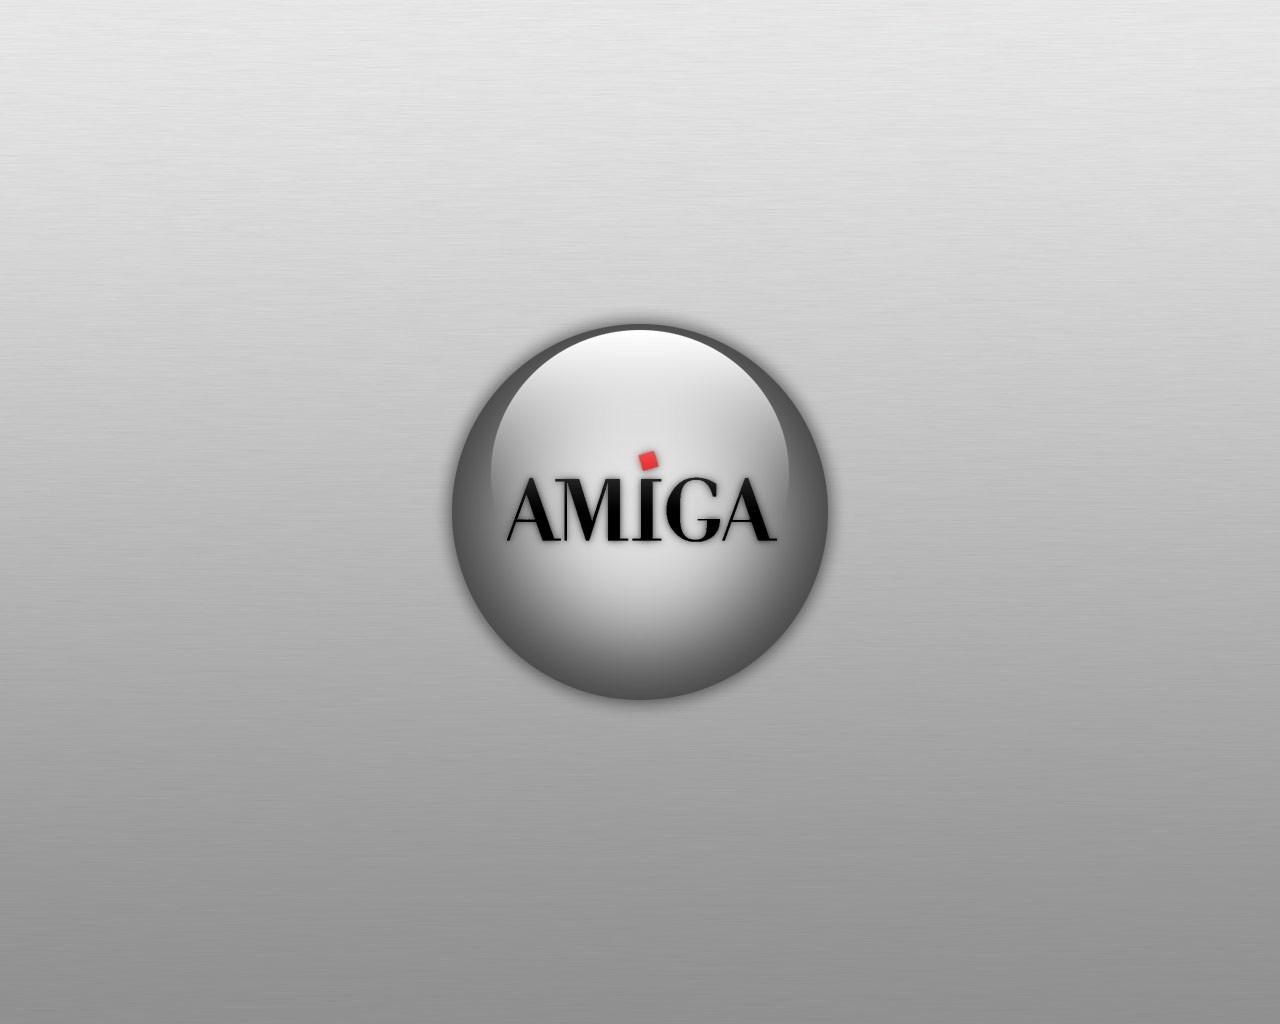 General 1280x1024 Amiga Commodore simple background computer